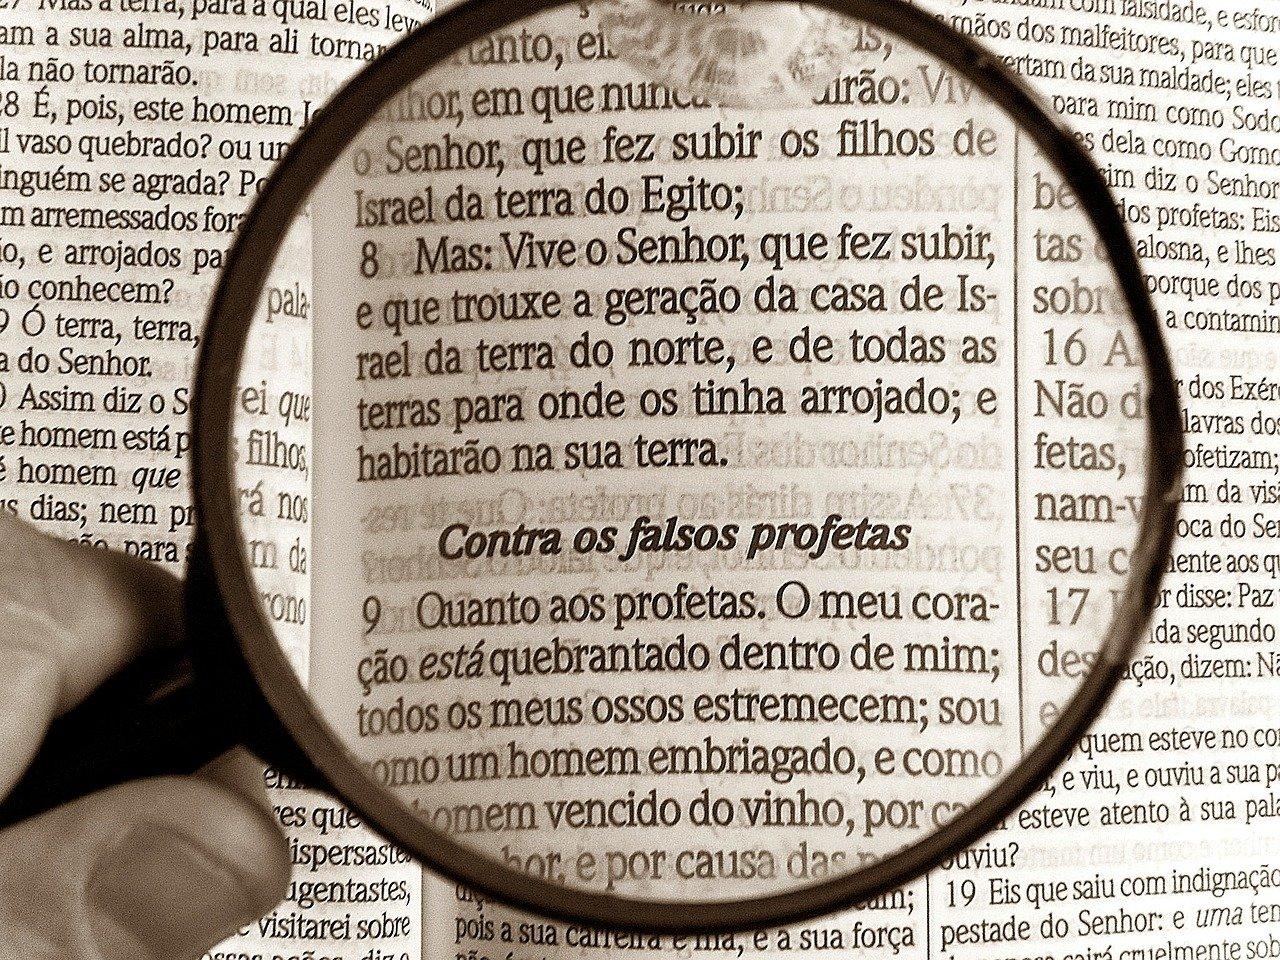 magnifying glass, bible, bibliology